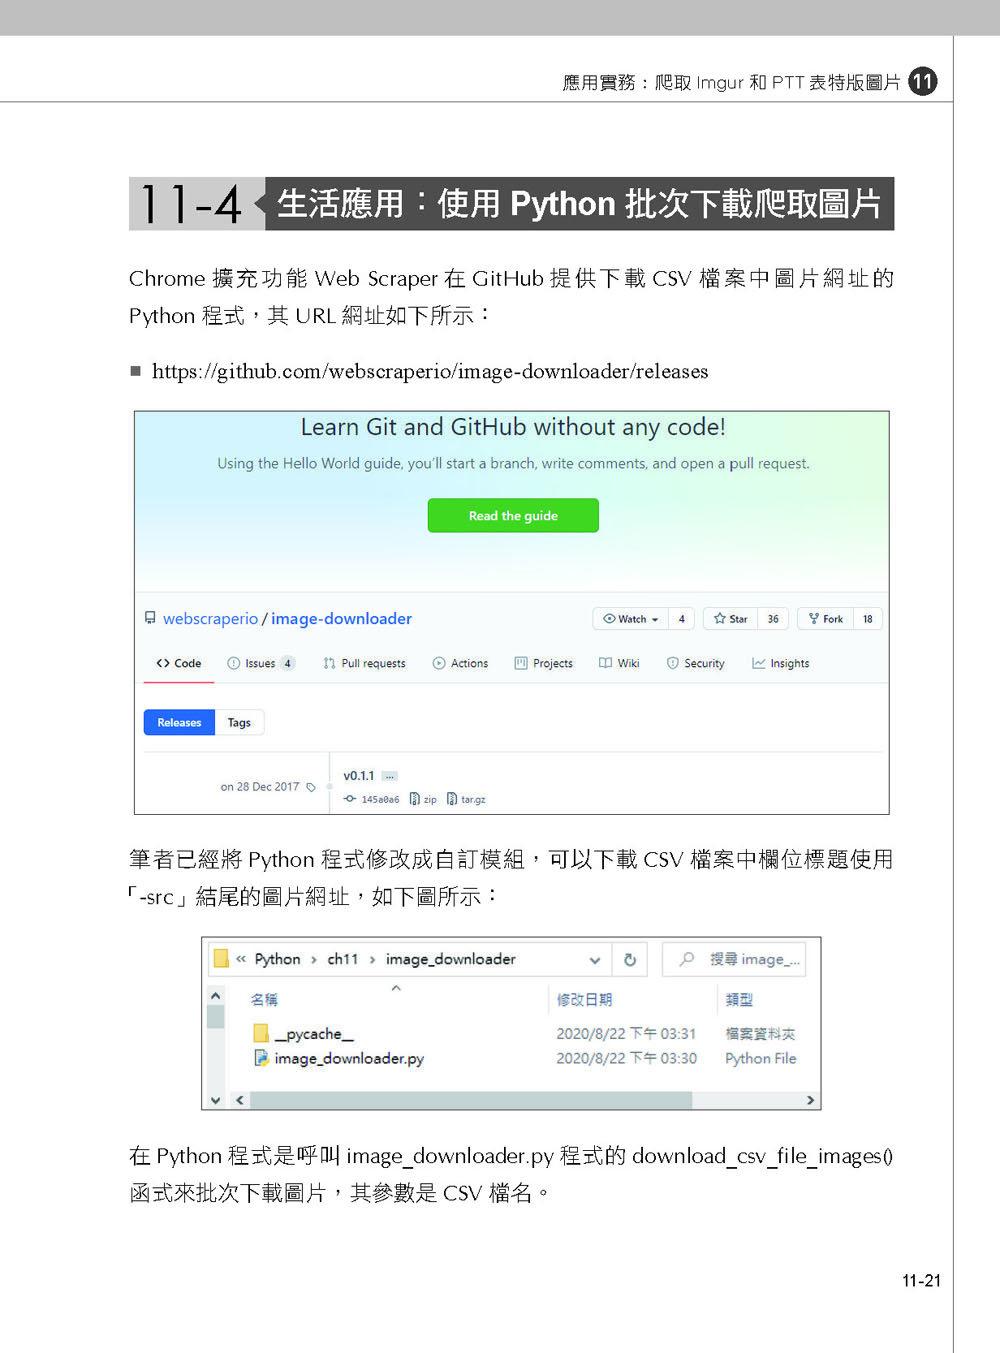 Python 從網路爬蟲到生活應用超實務:人工智慧世代必備的資料擷取術-preview-10